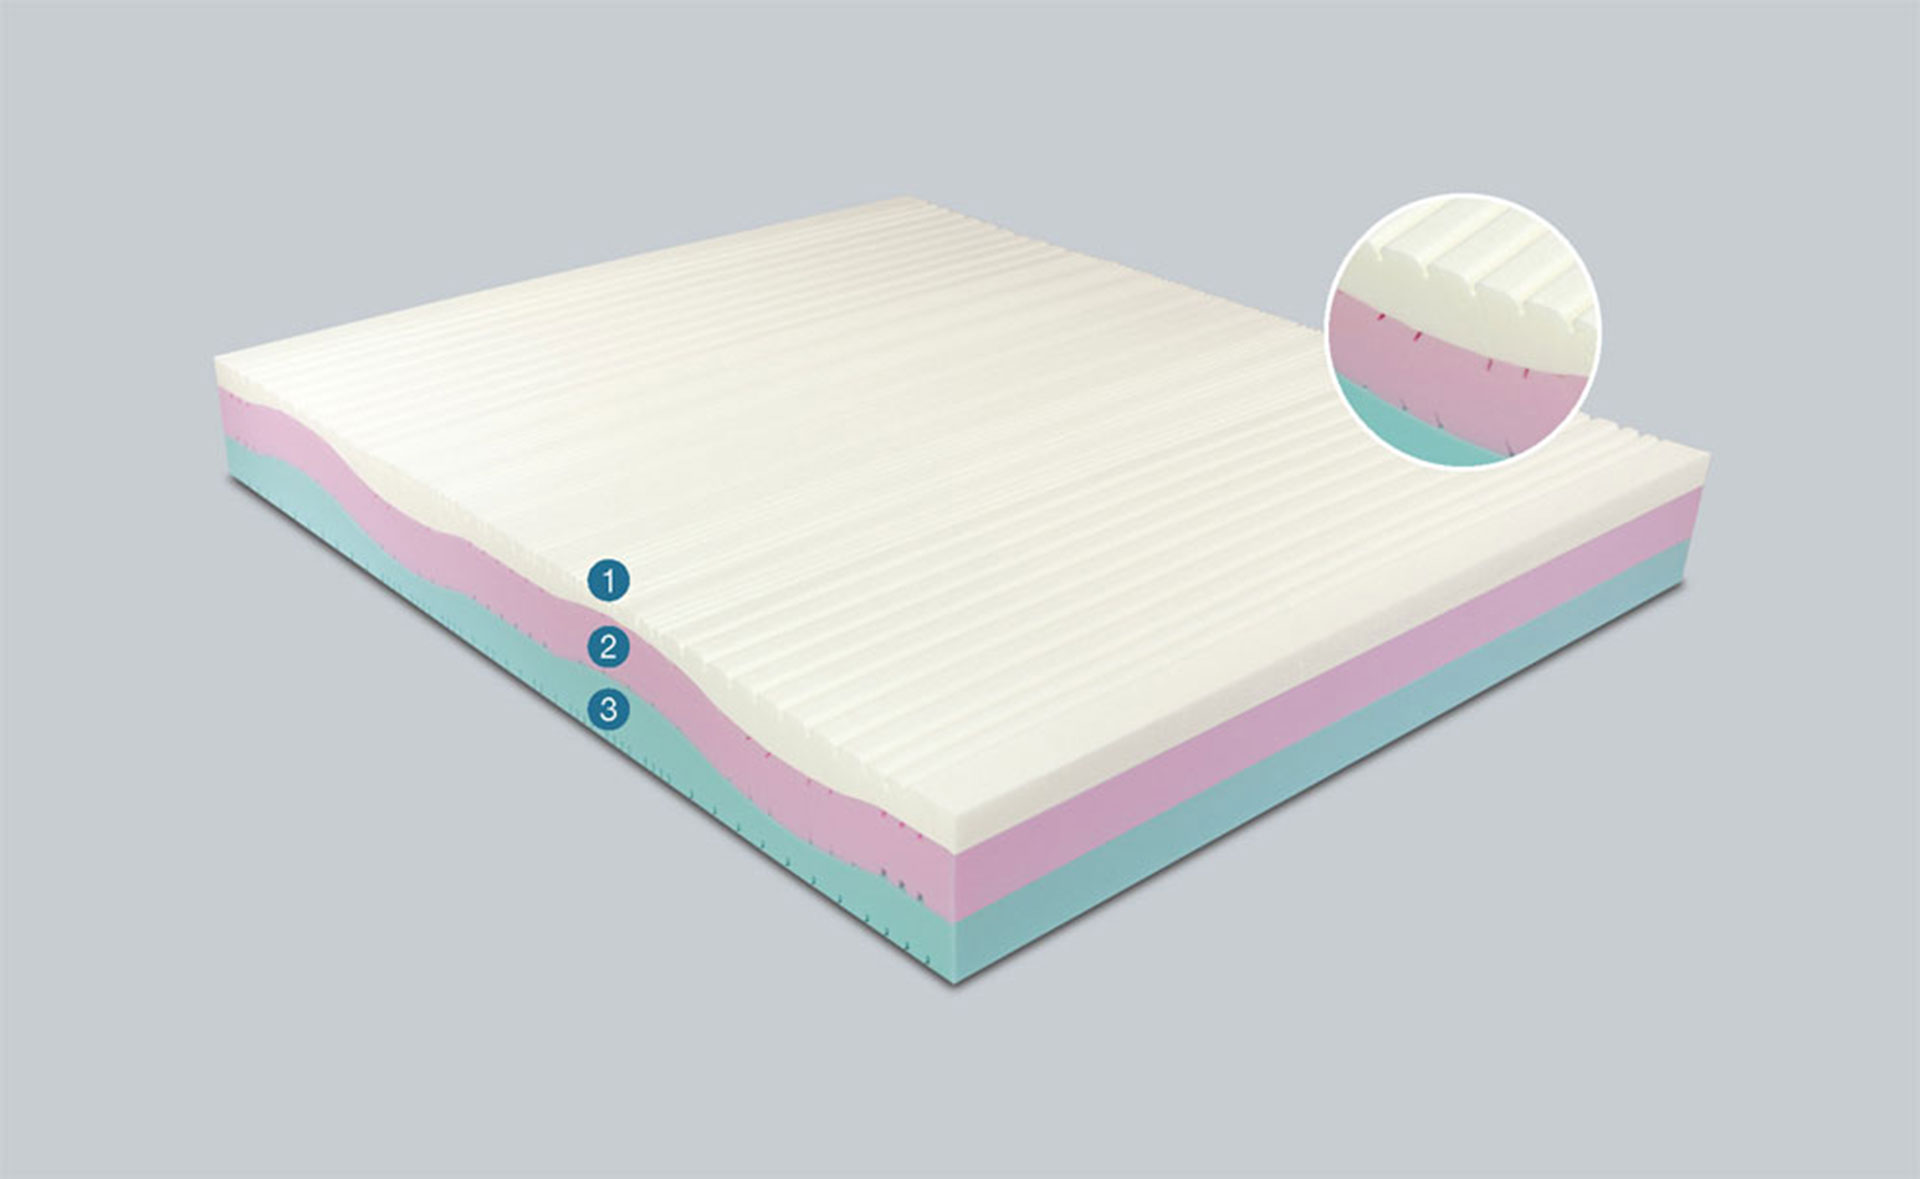 Origine - Materasso Memory Foam - Waterlily - Ergolattex materassi misure materassi una x